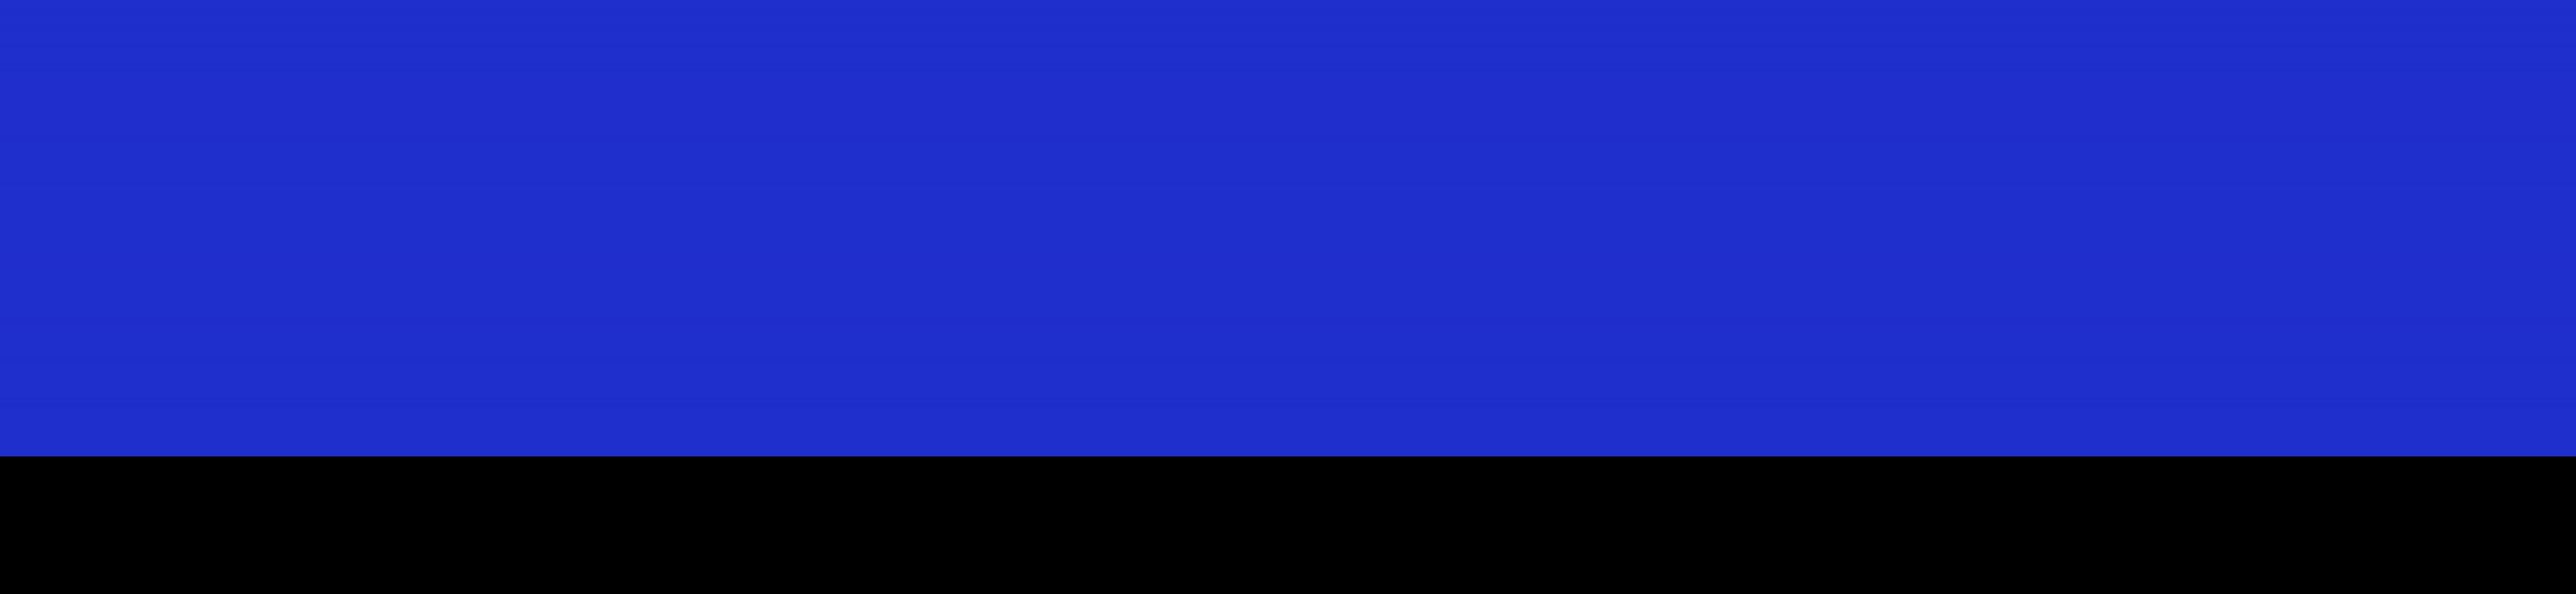 blue gradient overlay